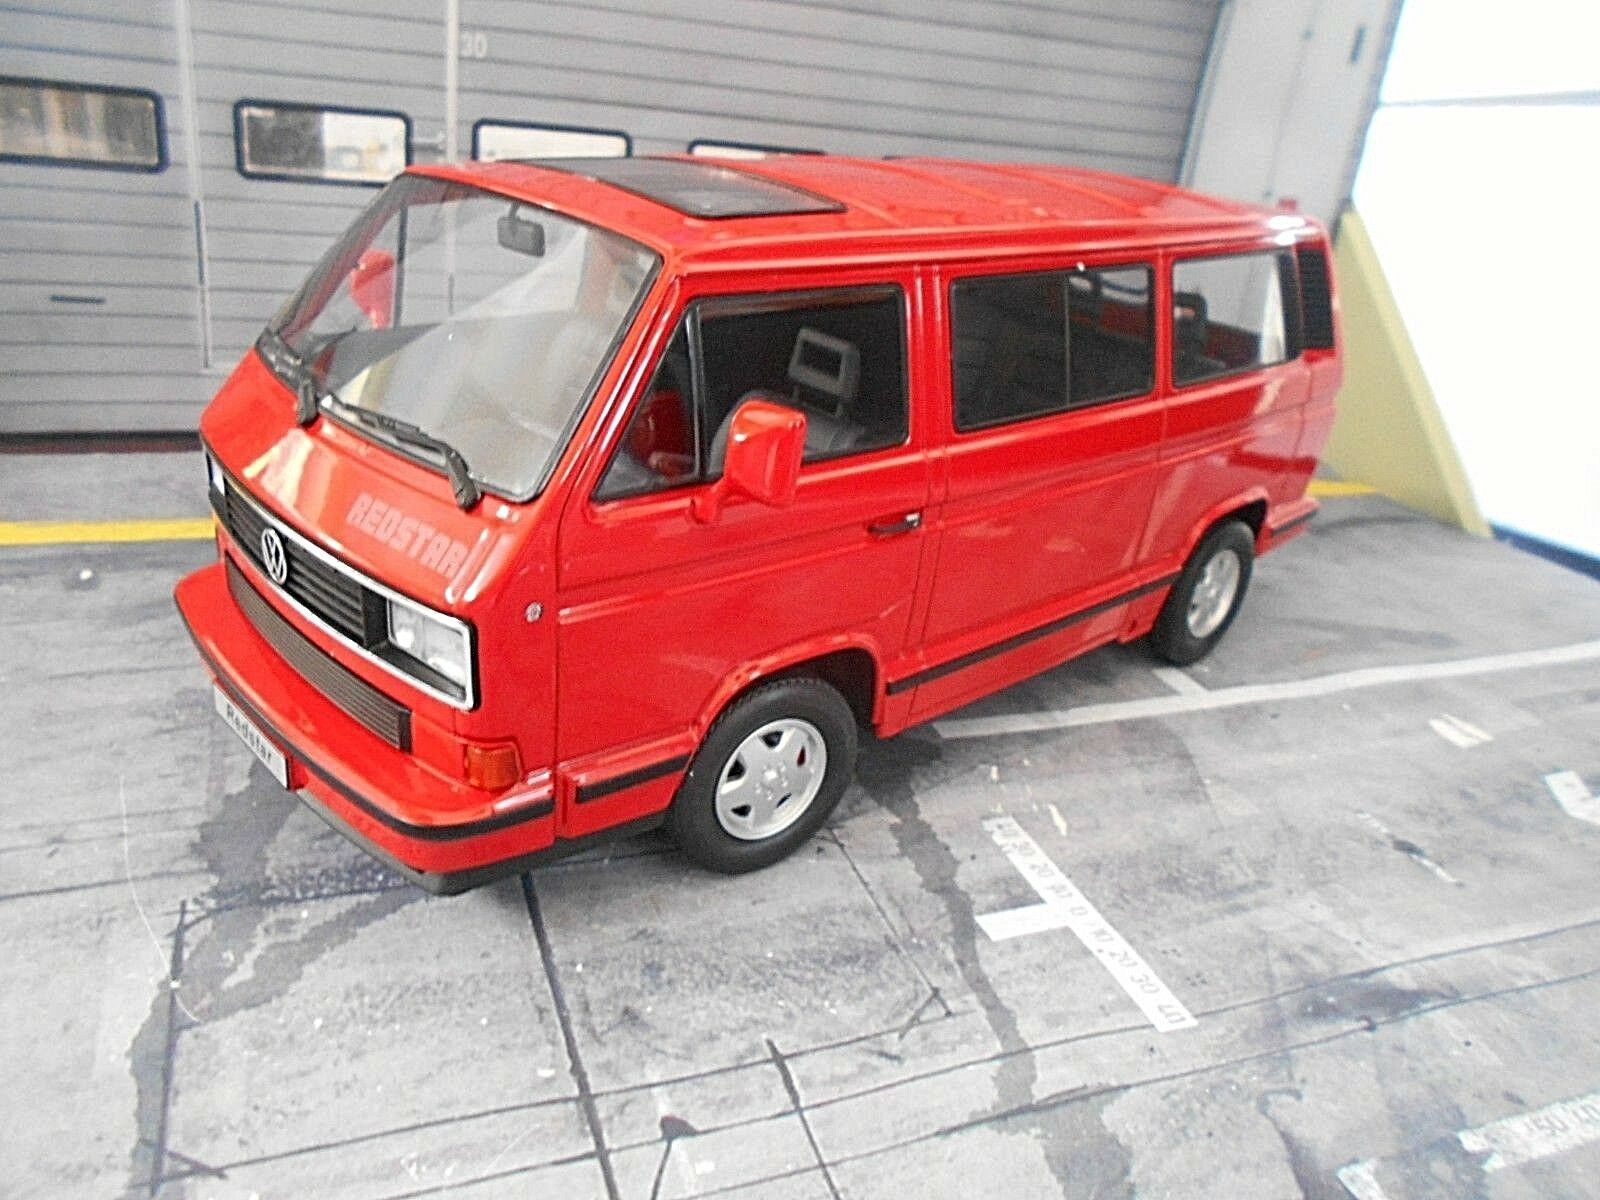 VW VOLKSWAGEN BUS t3 Multivan rosso STAR rosso ROSSO 1993 Diecast KK 1/500 NEW 1:18